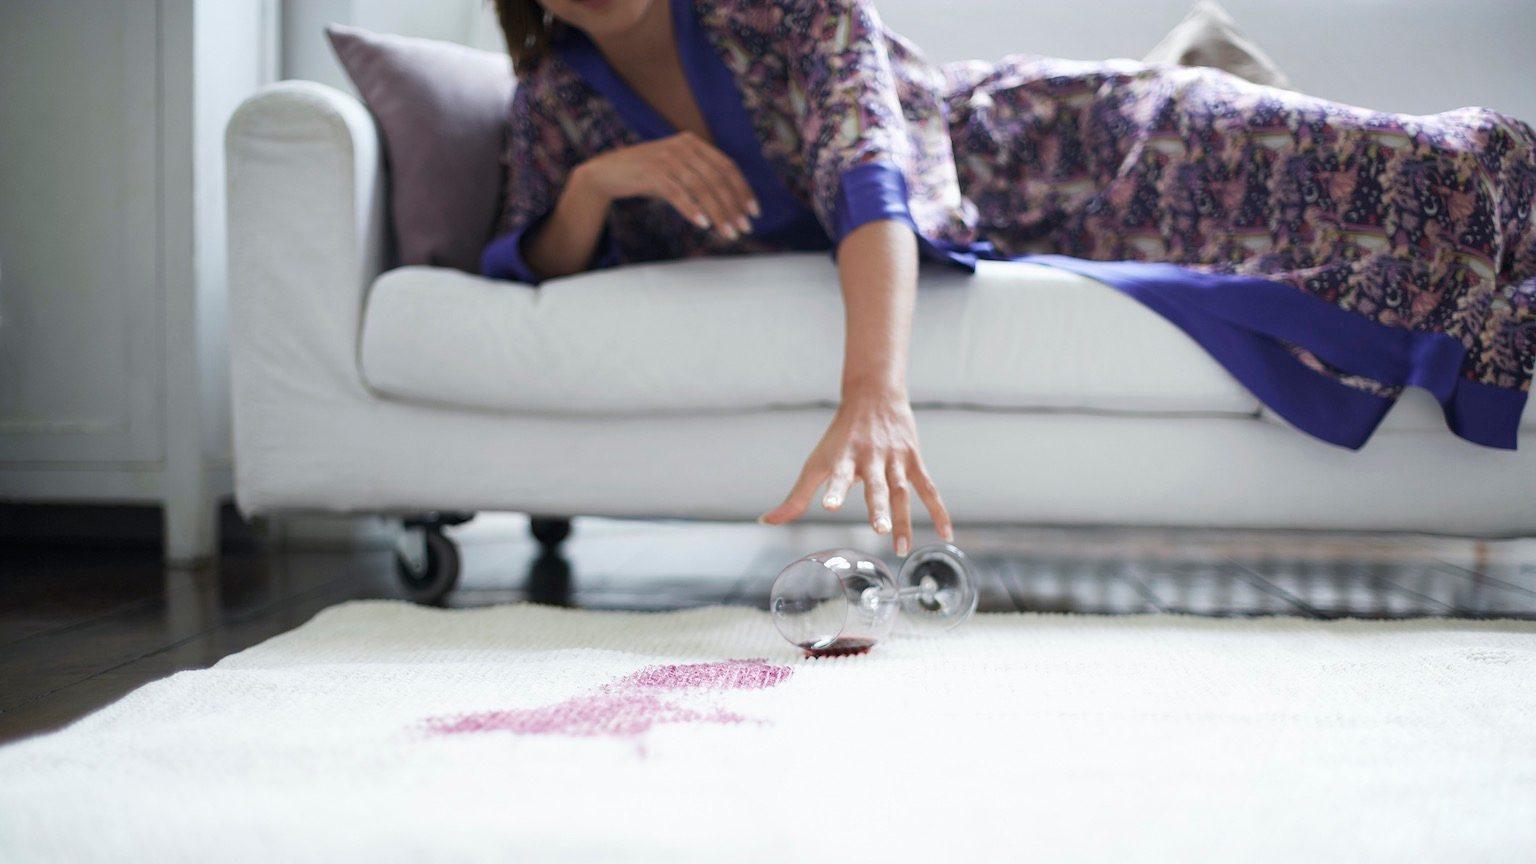 Woman Reaching for Fallen Wine Glass